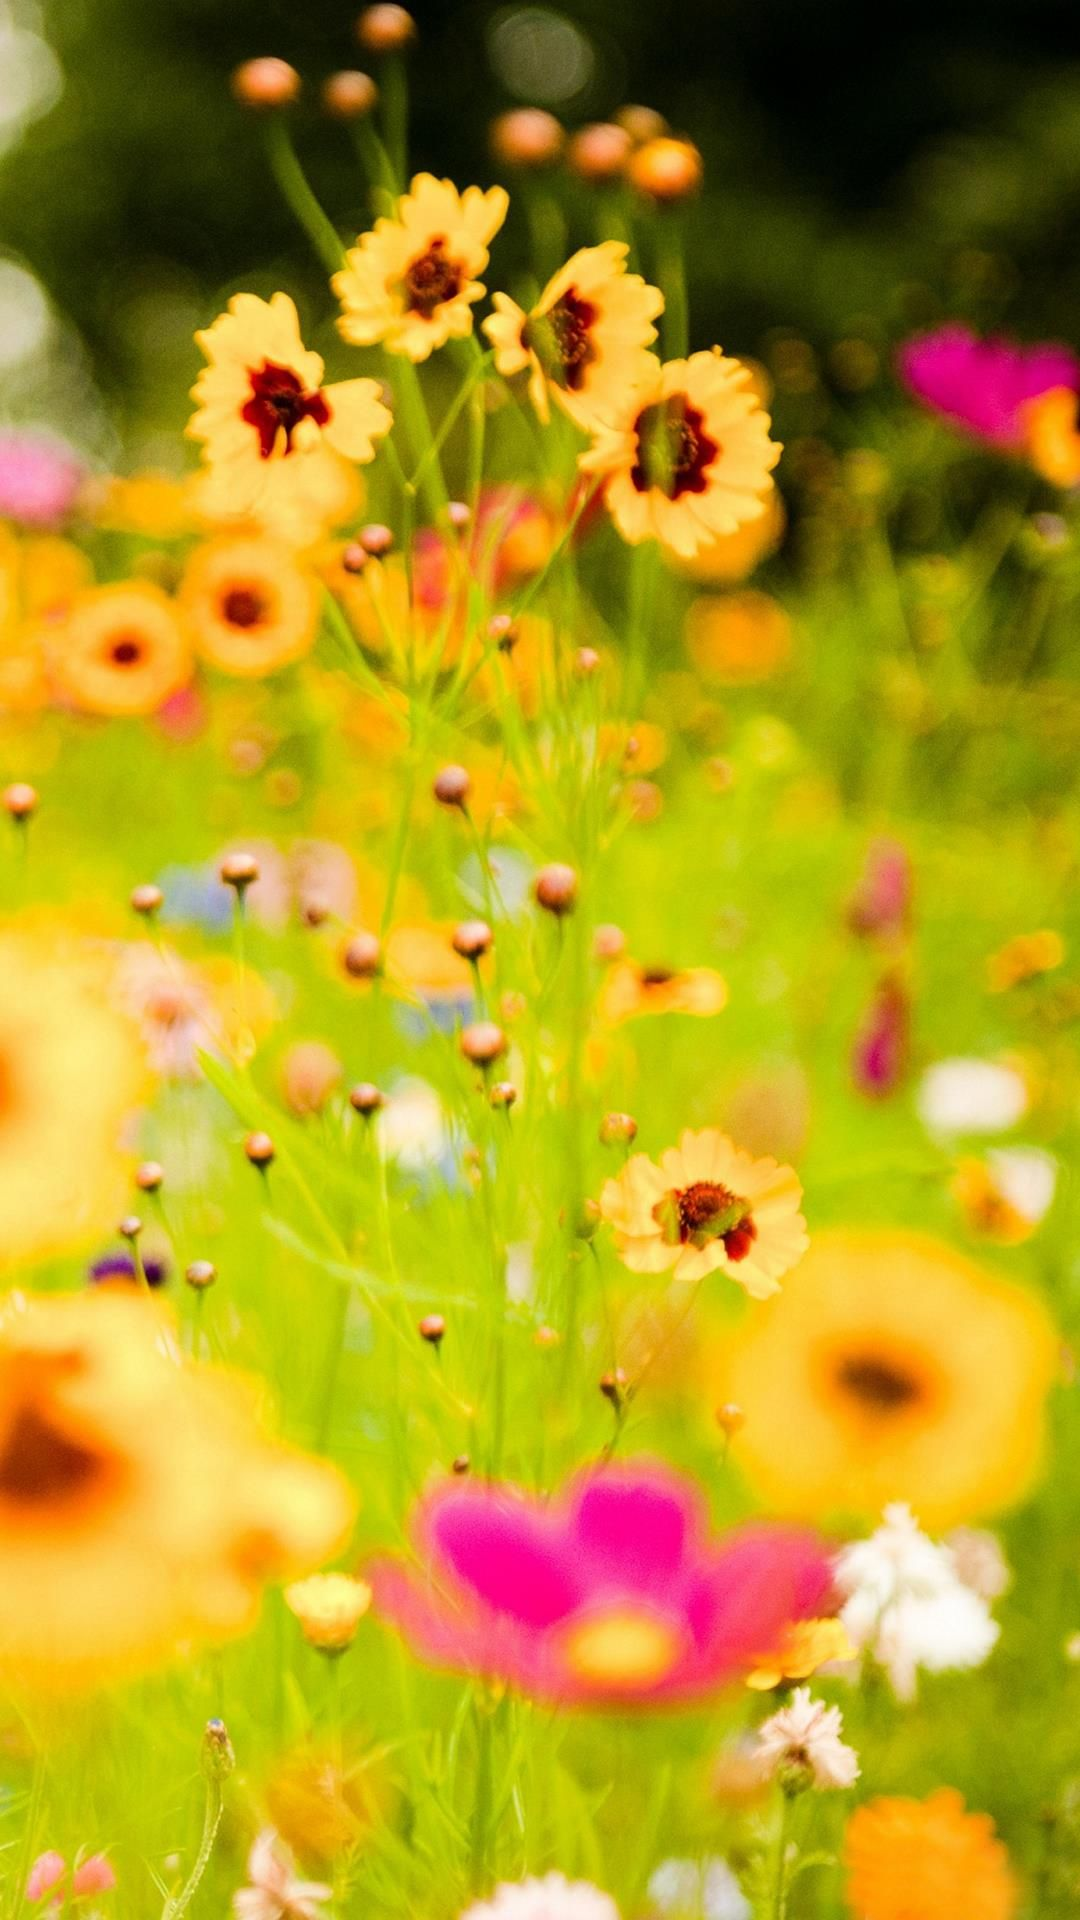 Download Samsung Galaxy S5 Wallpaper Nature 727 Wallpaper Nature Flowers Flowers Photography Love Flowers